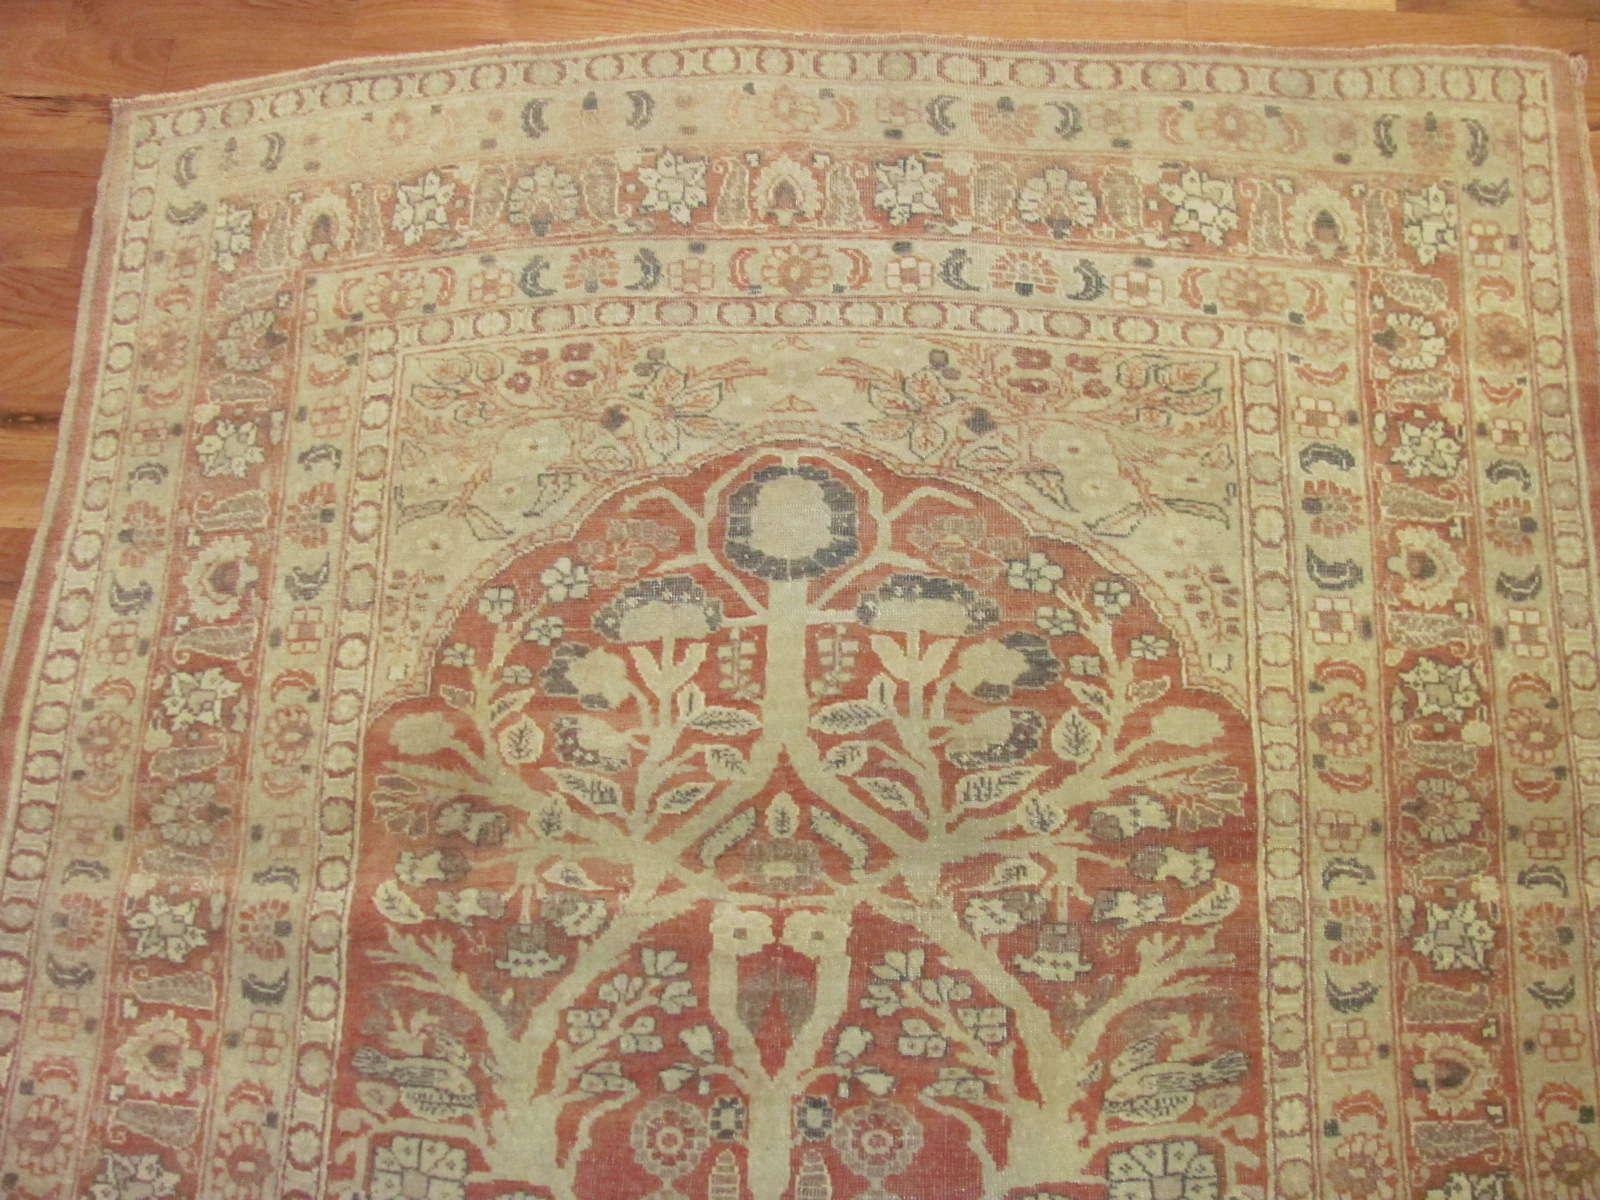 24668 antique persian tabriz prayer rug 4 x 4,8 -1